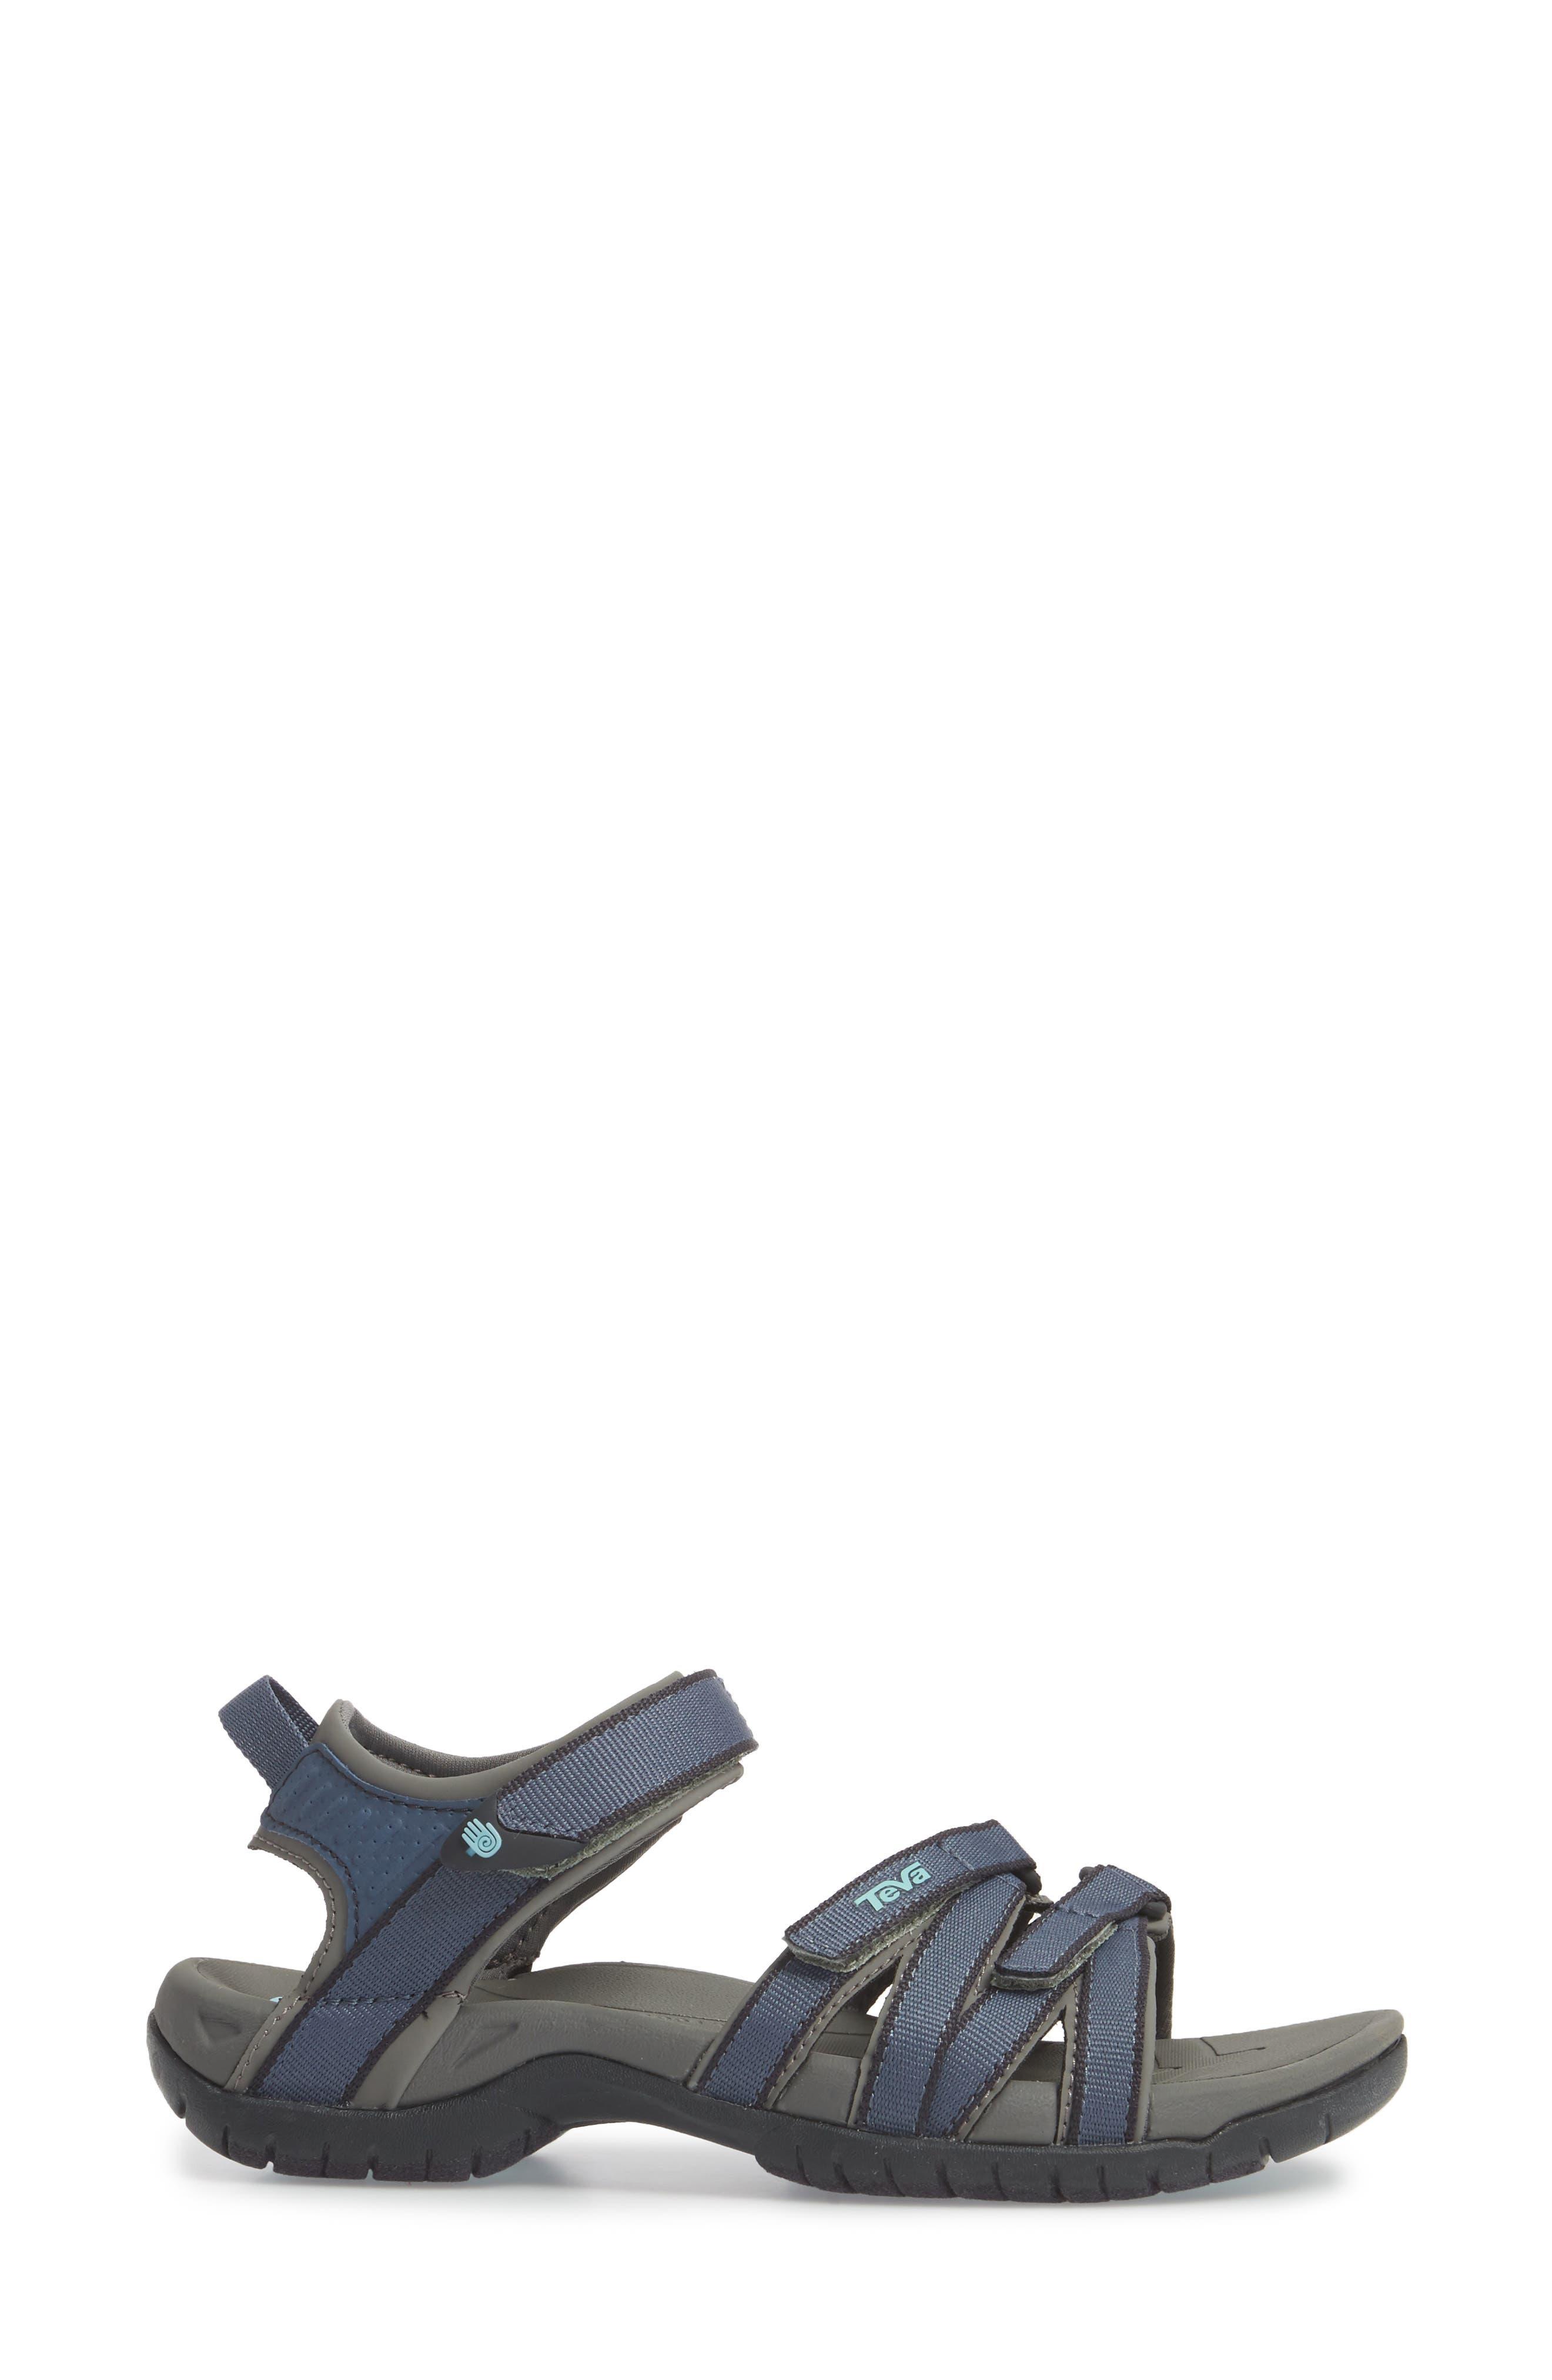 'Tirra' Sandal,                             Alternate thumbnail 3, color,                             BERING SEA